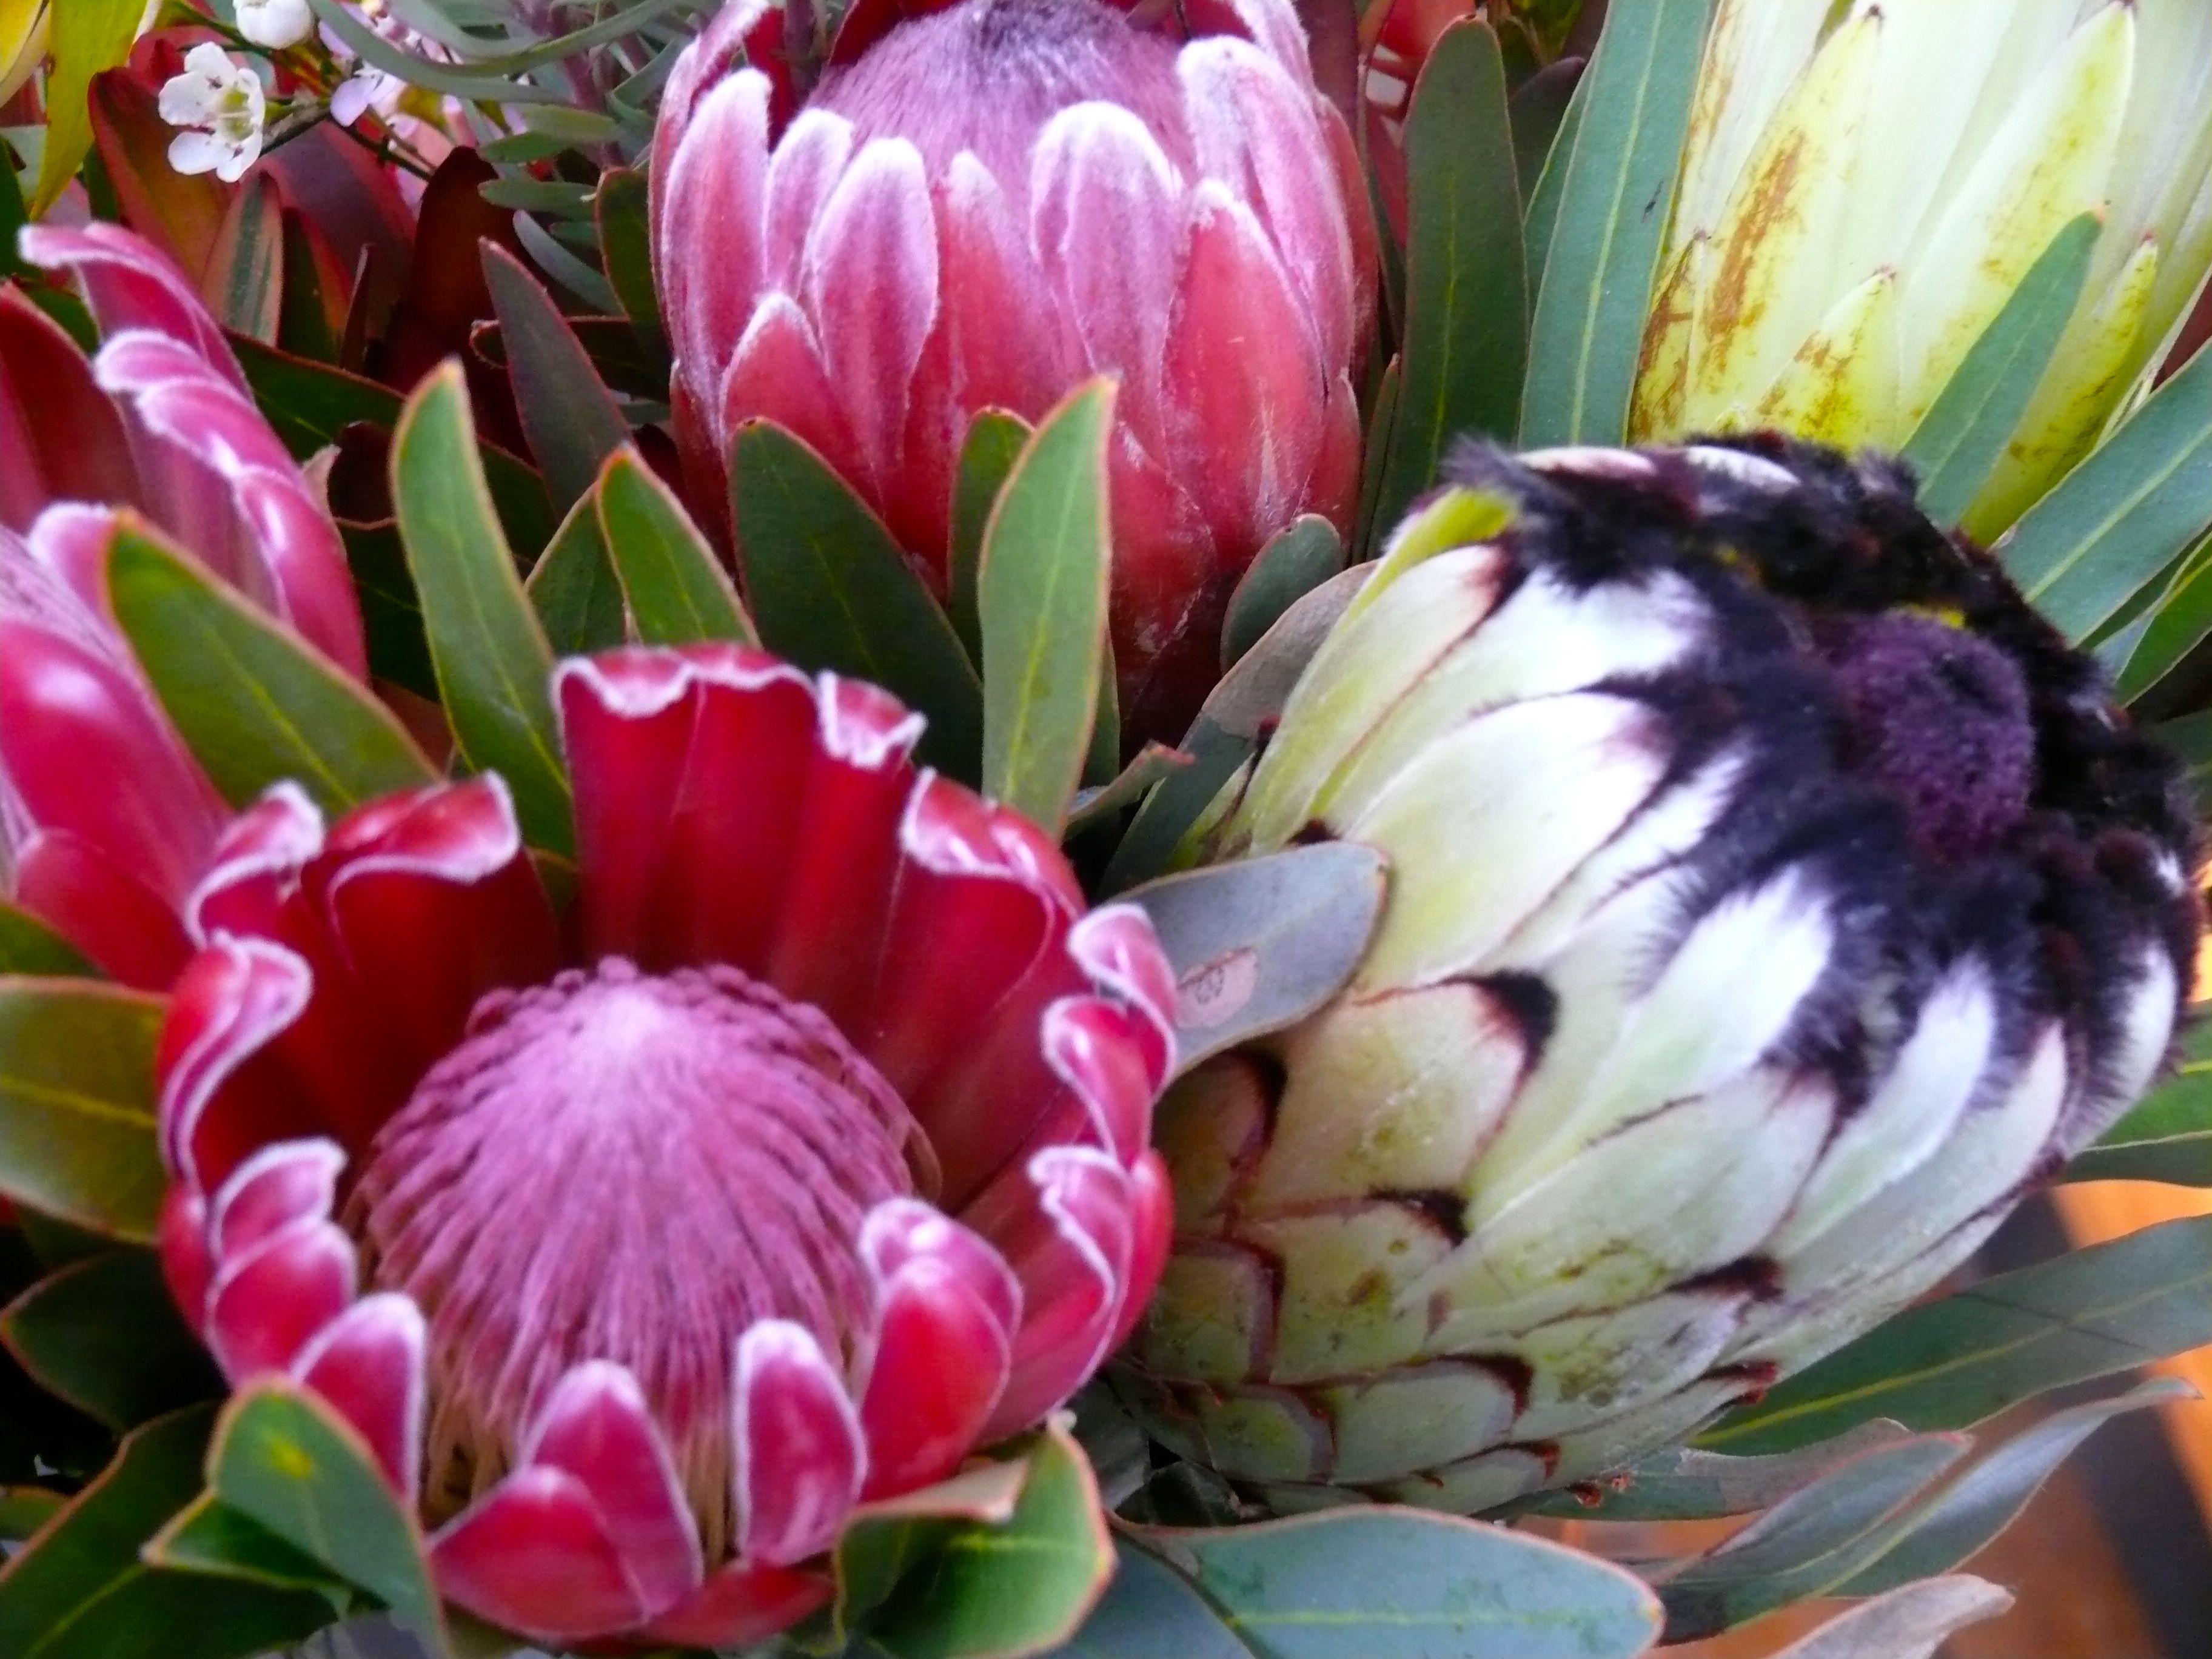 South Africa S National Flower Repinned By Www Loisjoyhofmann Com Love Proteas Protea Flower Beautiful Flowers Flora Flowers